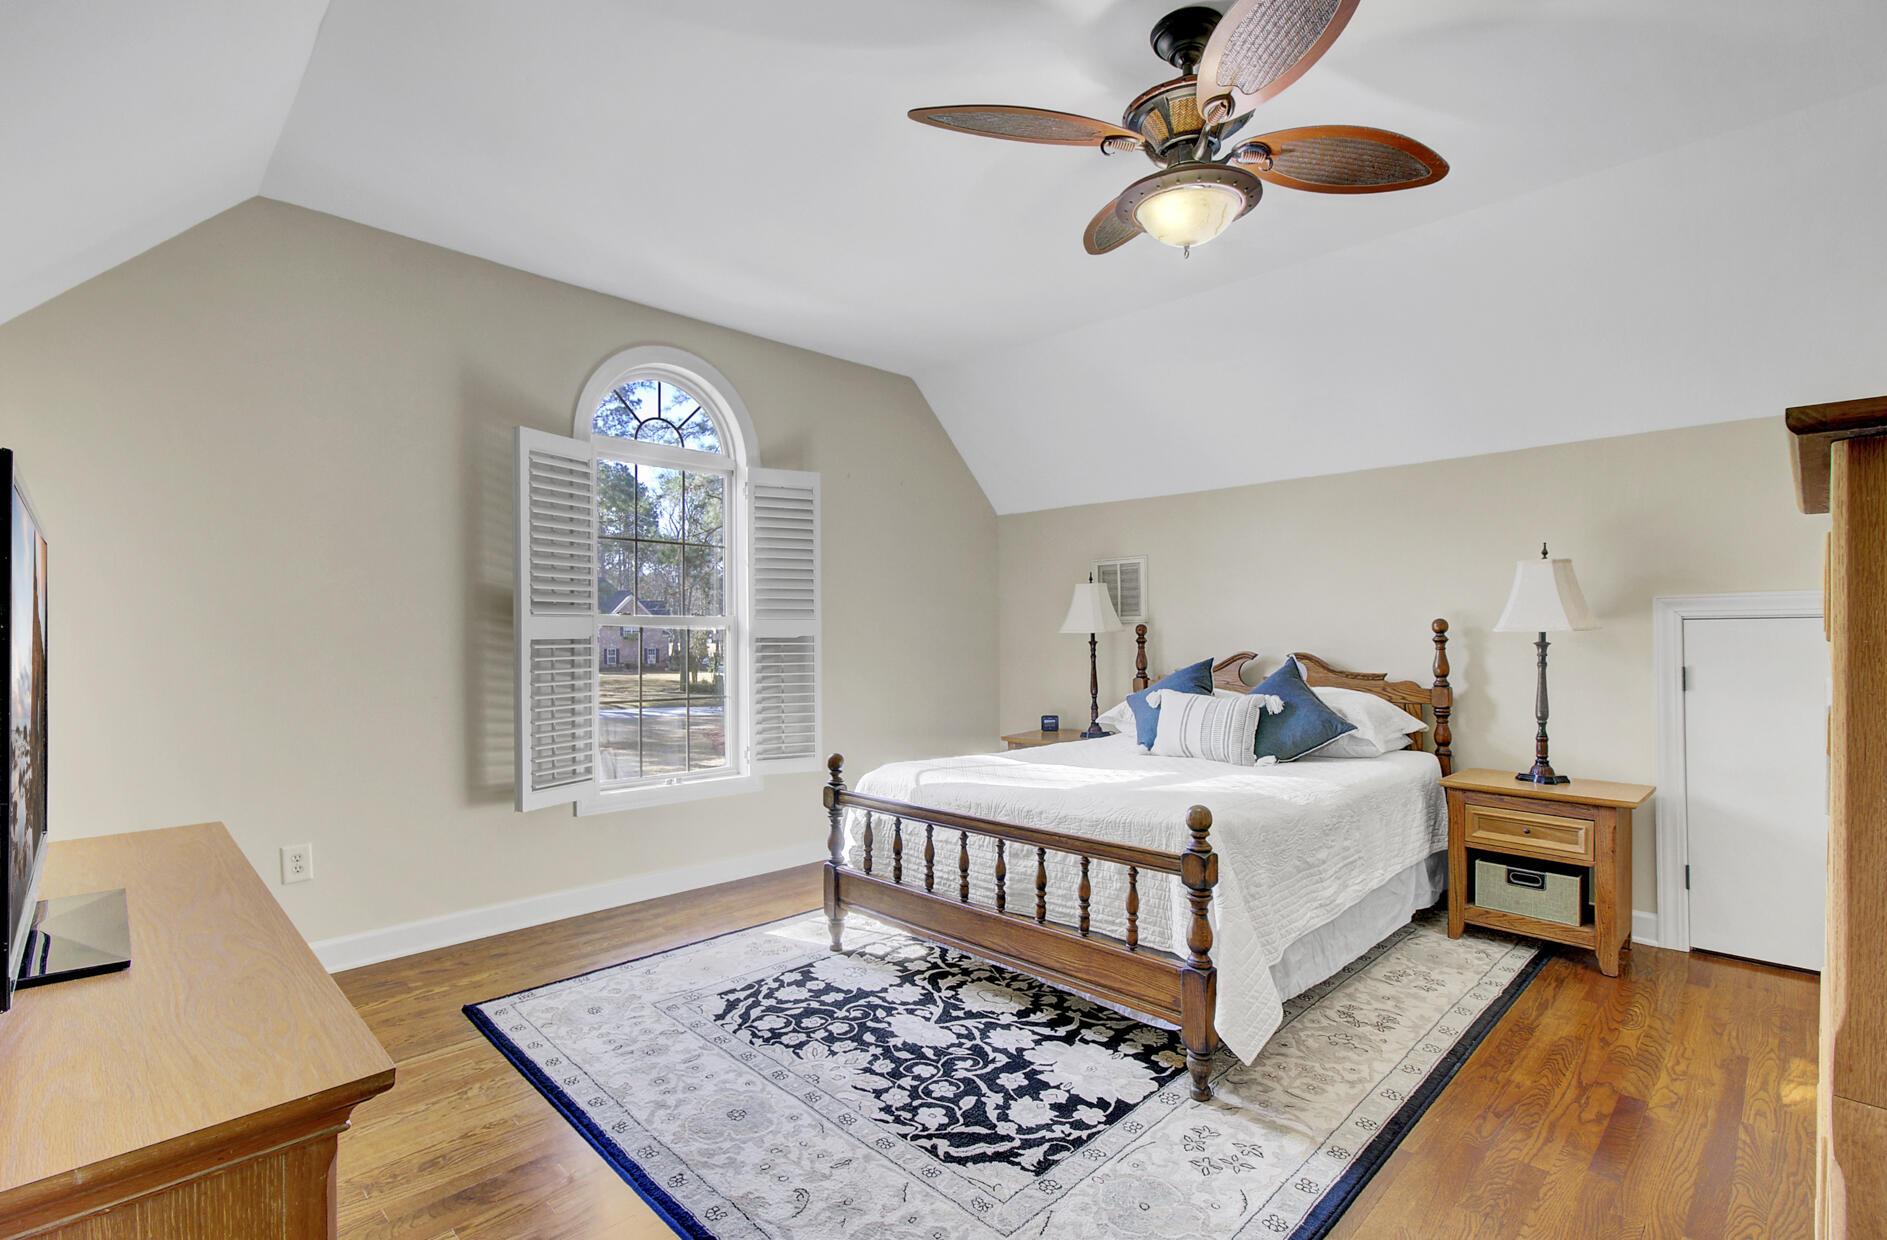 Dunes West Homes For Sale - 4123 Colonel Vanderhorst, Mount Pleasant, SC - 1